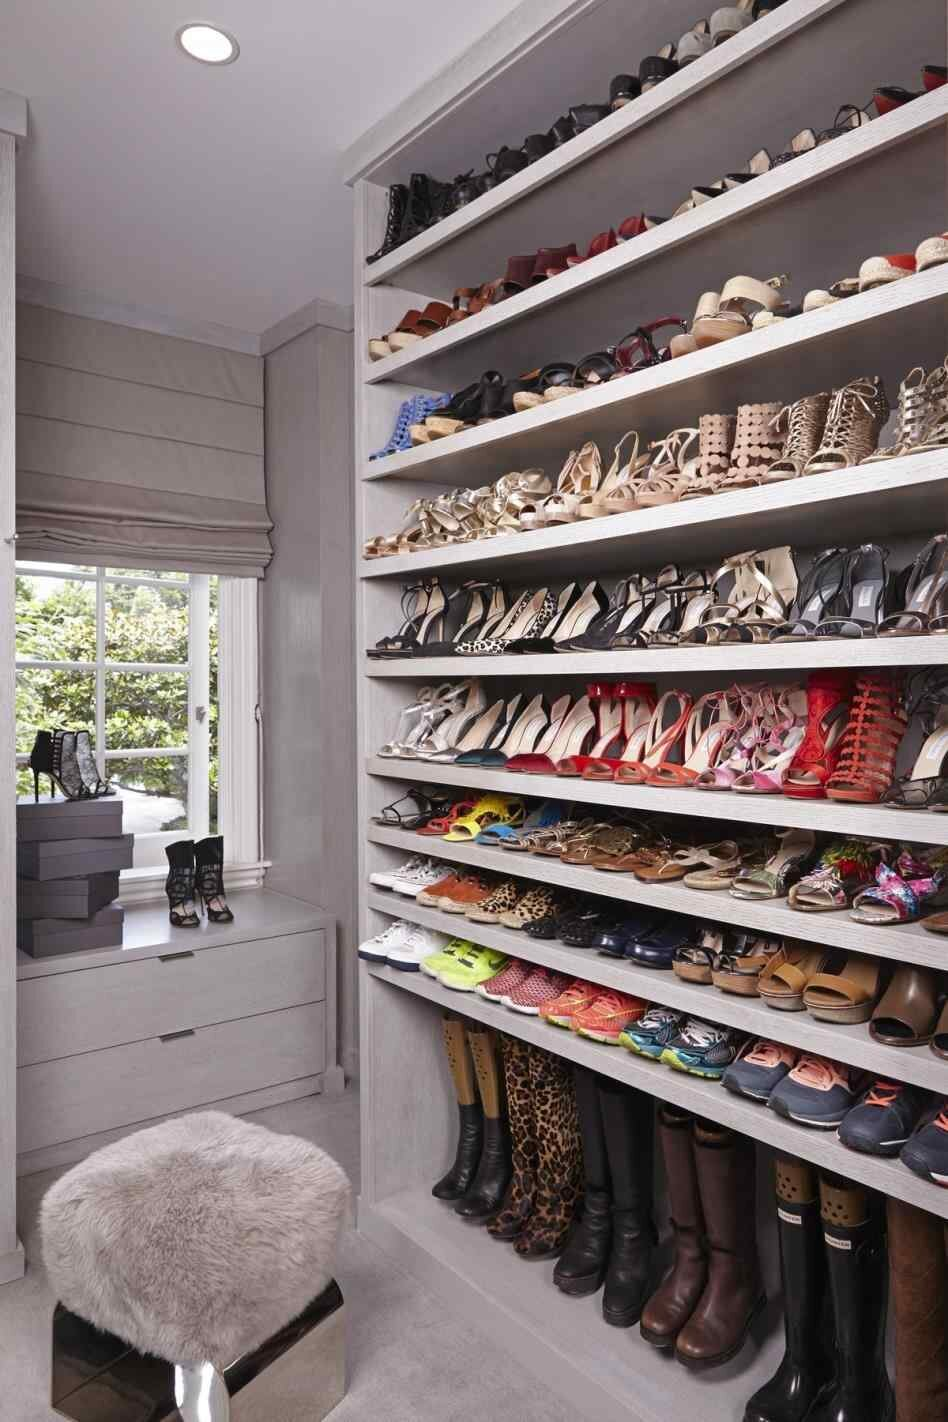 rack-groupon-pics-gestellorhgestellous-wood-fabulous-white-wardrobe-walk-closet-design-storage-rhdmaupdorg-wood-Luxury-Shoe-Closet-fabulous-white-wardrobe-walk-closet.jpg